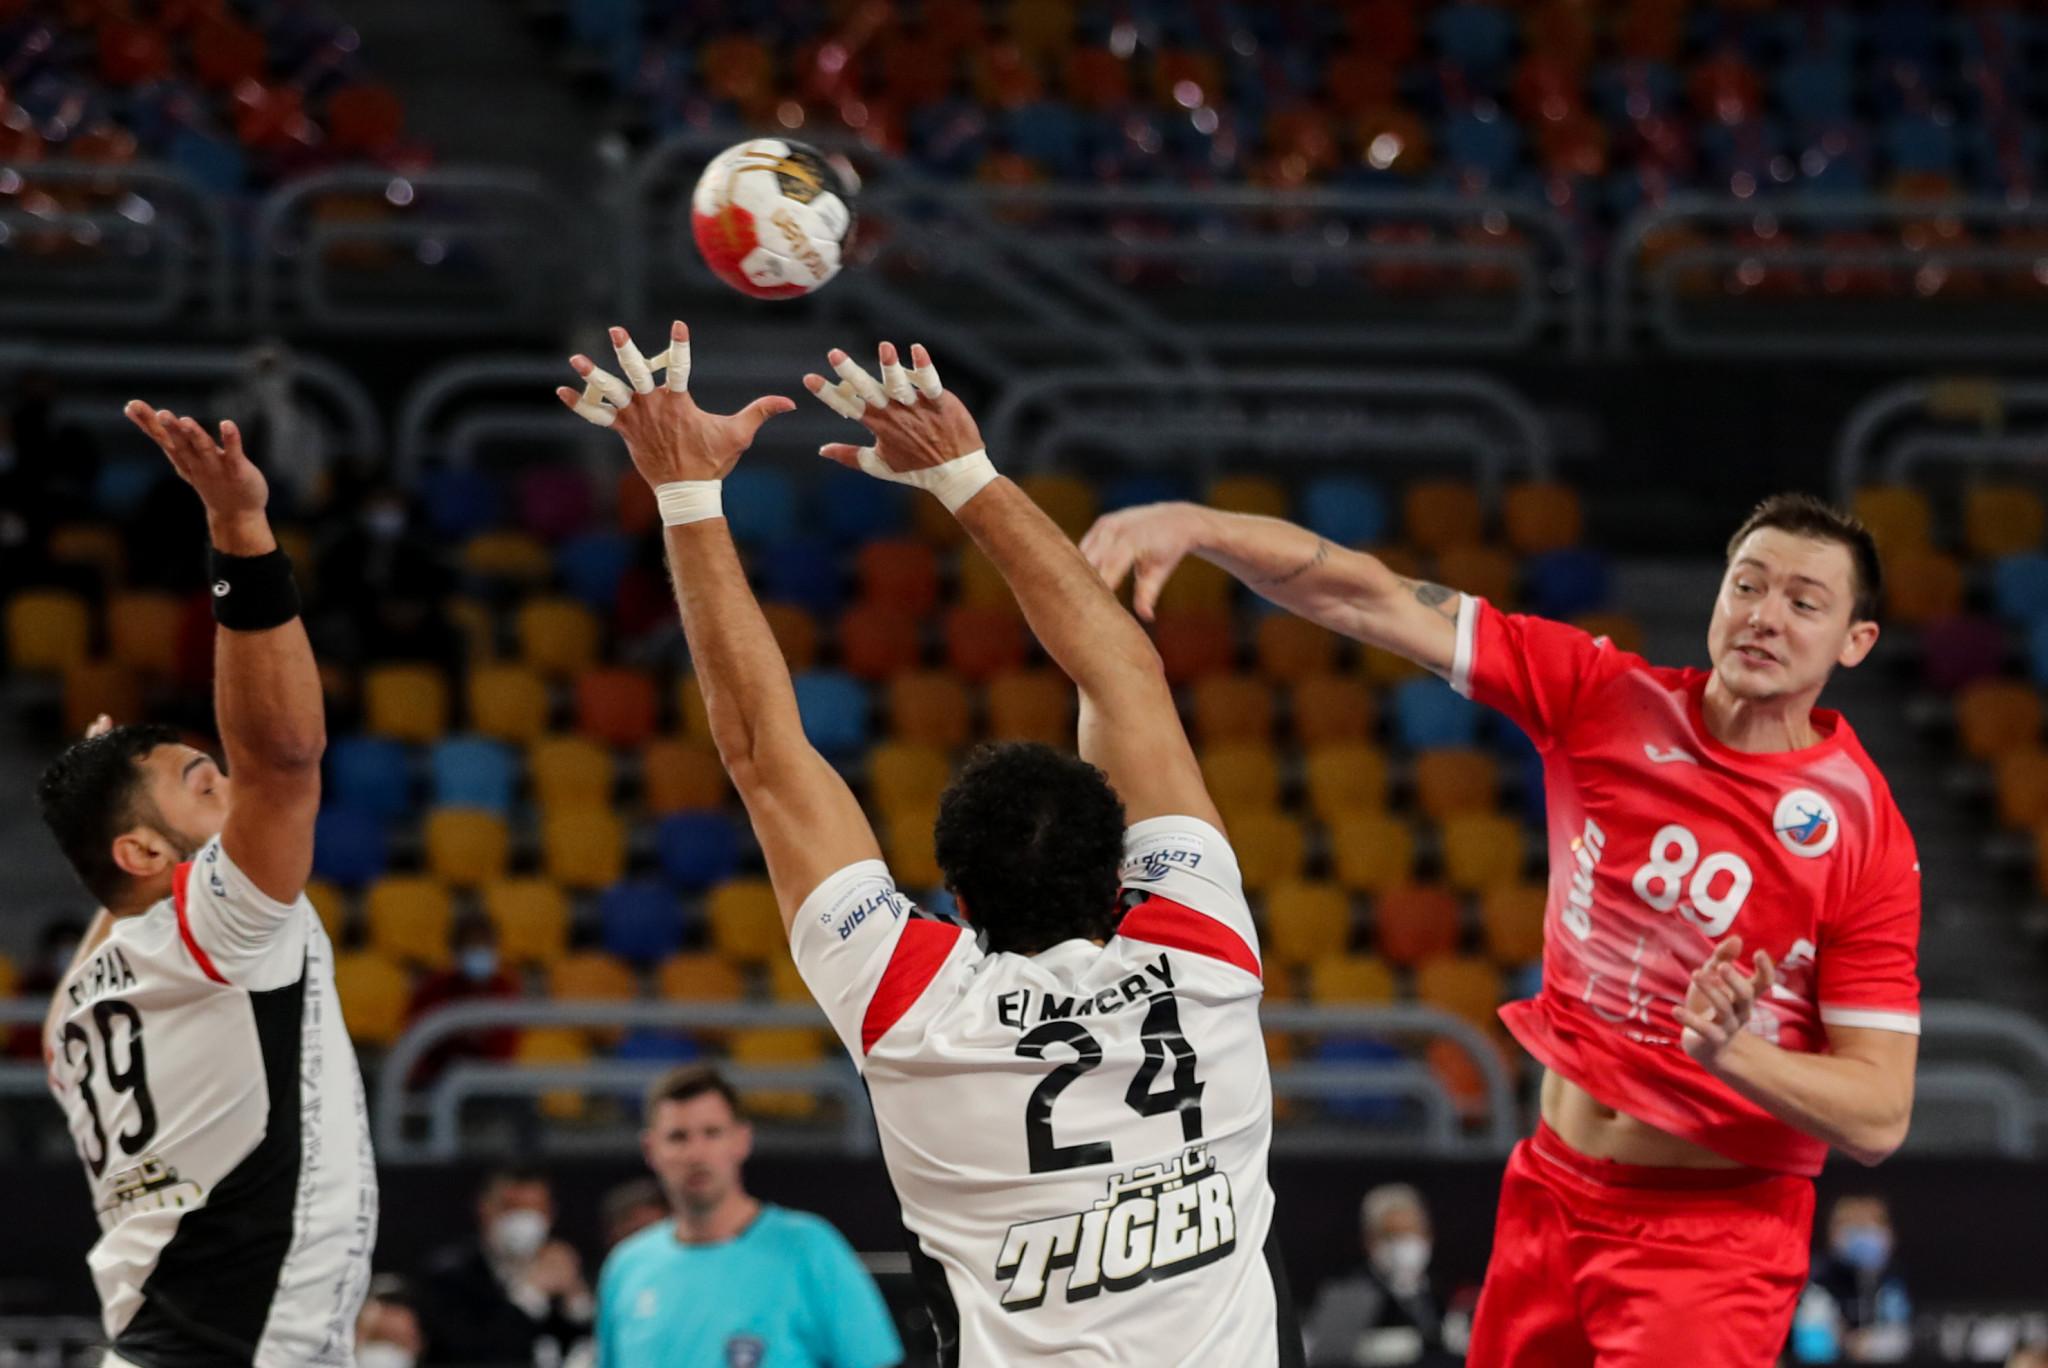 Hosts Egypt among winners as main round of World Men's Handball Championship begins